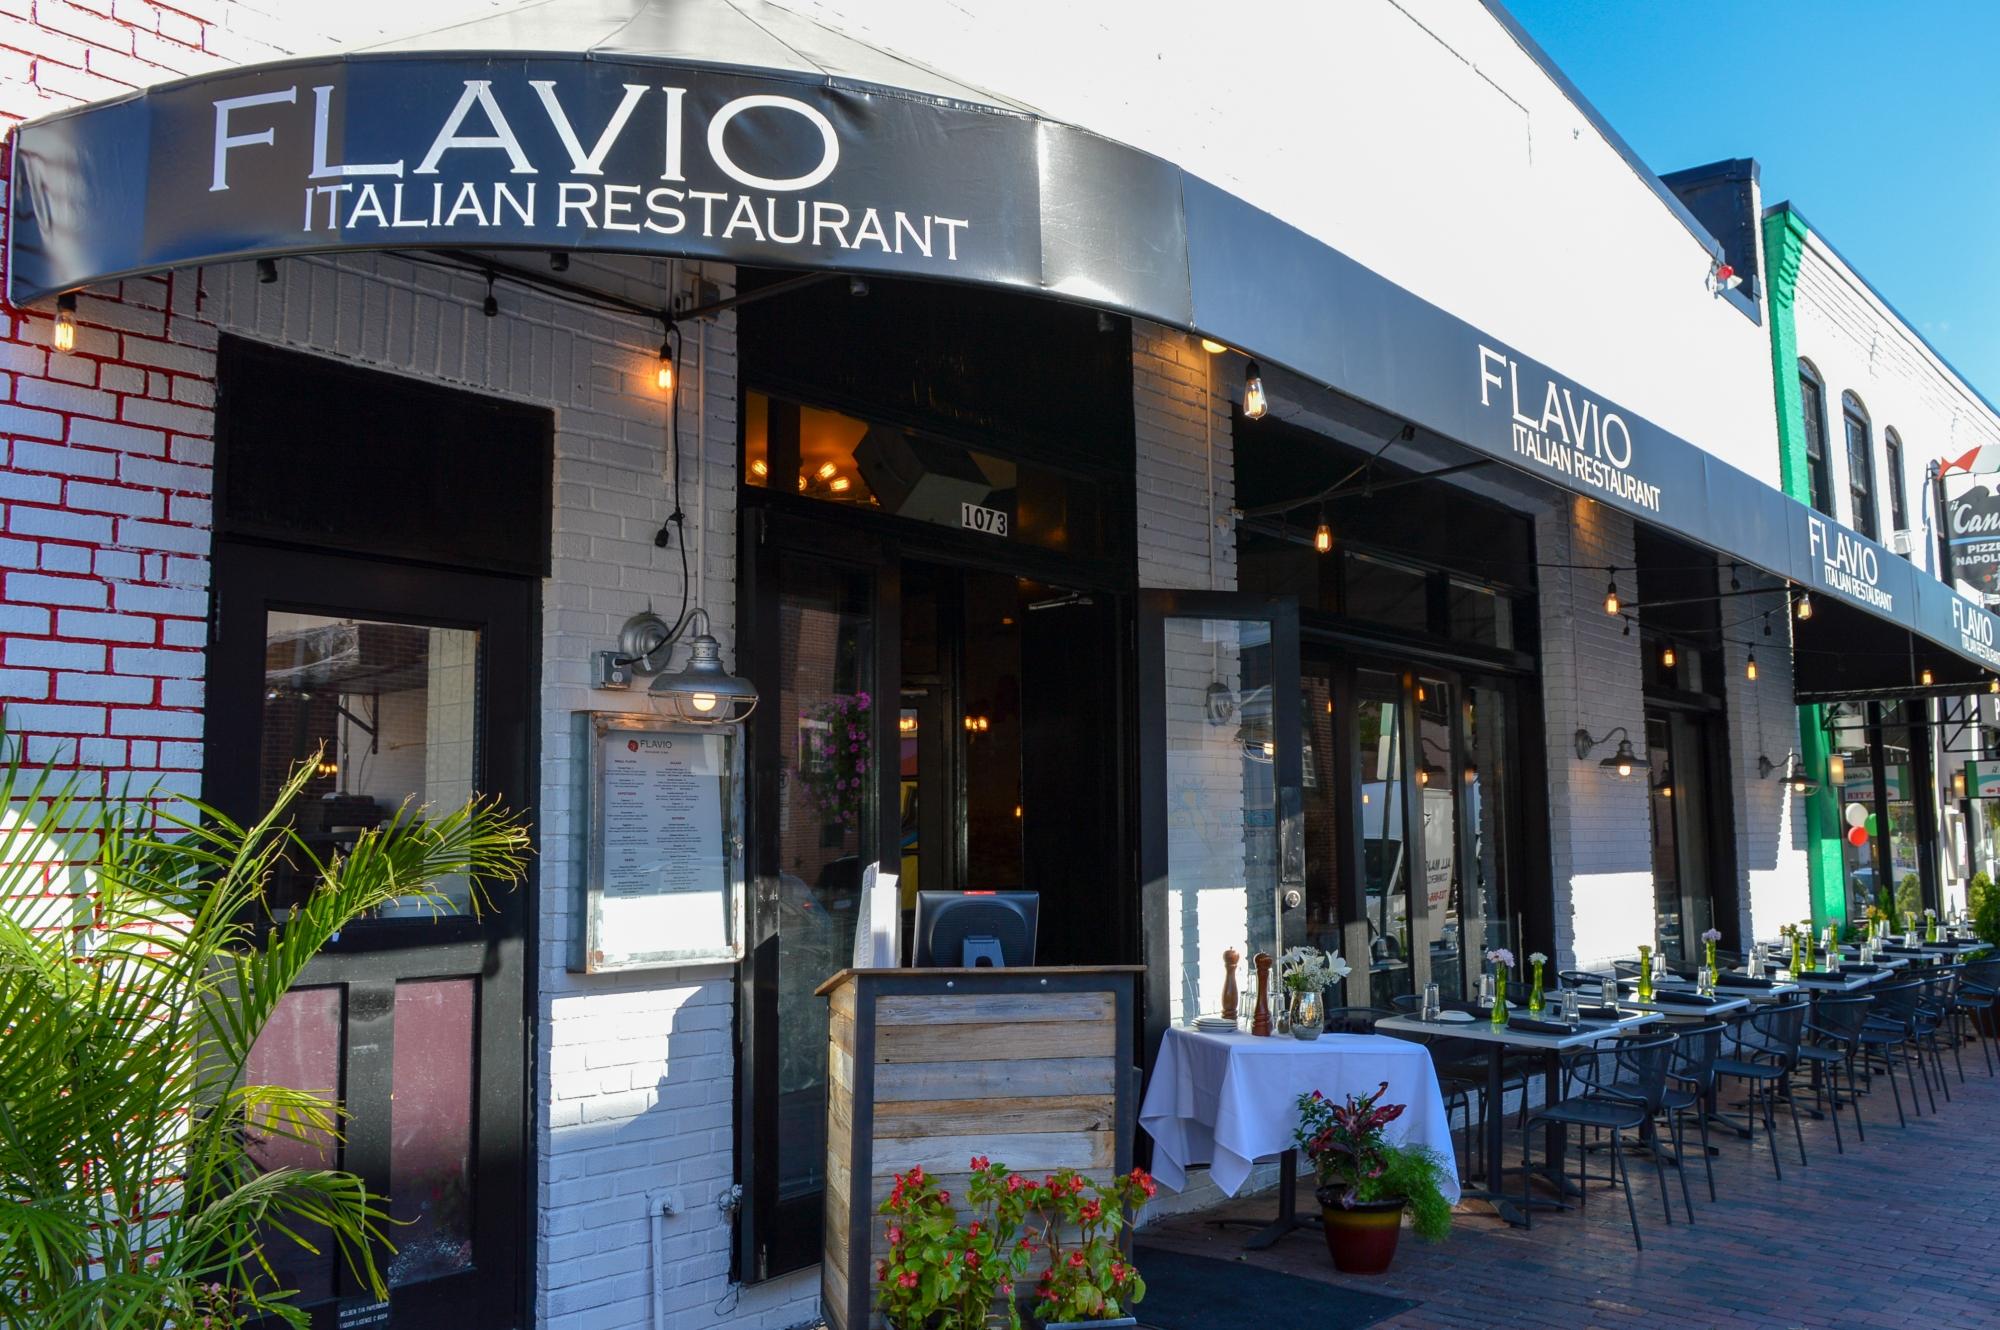 Flavio Italian restaurant, Georgetown, Washington D.C.